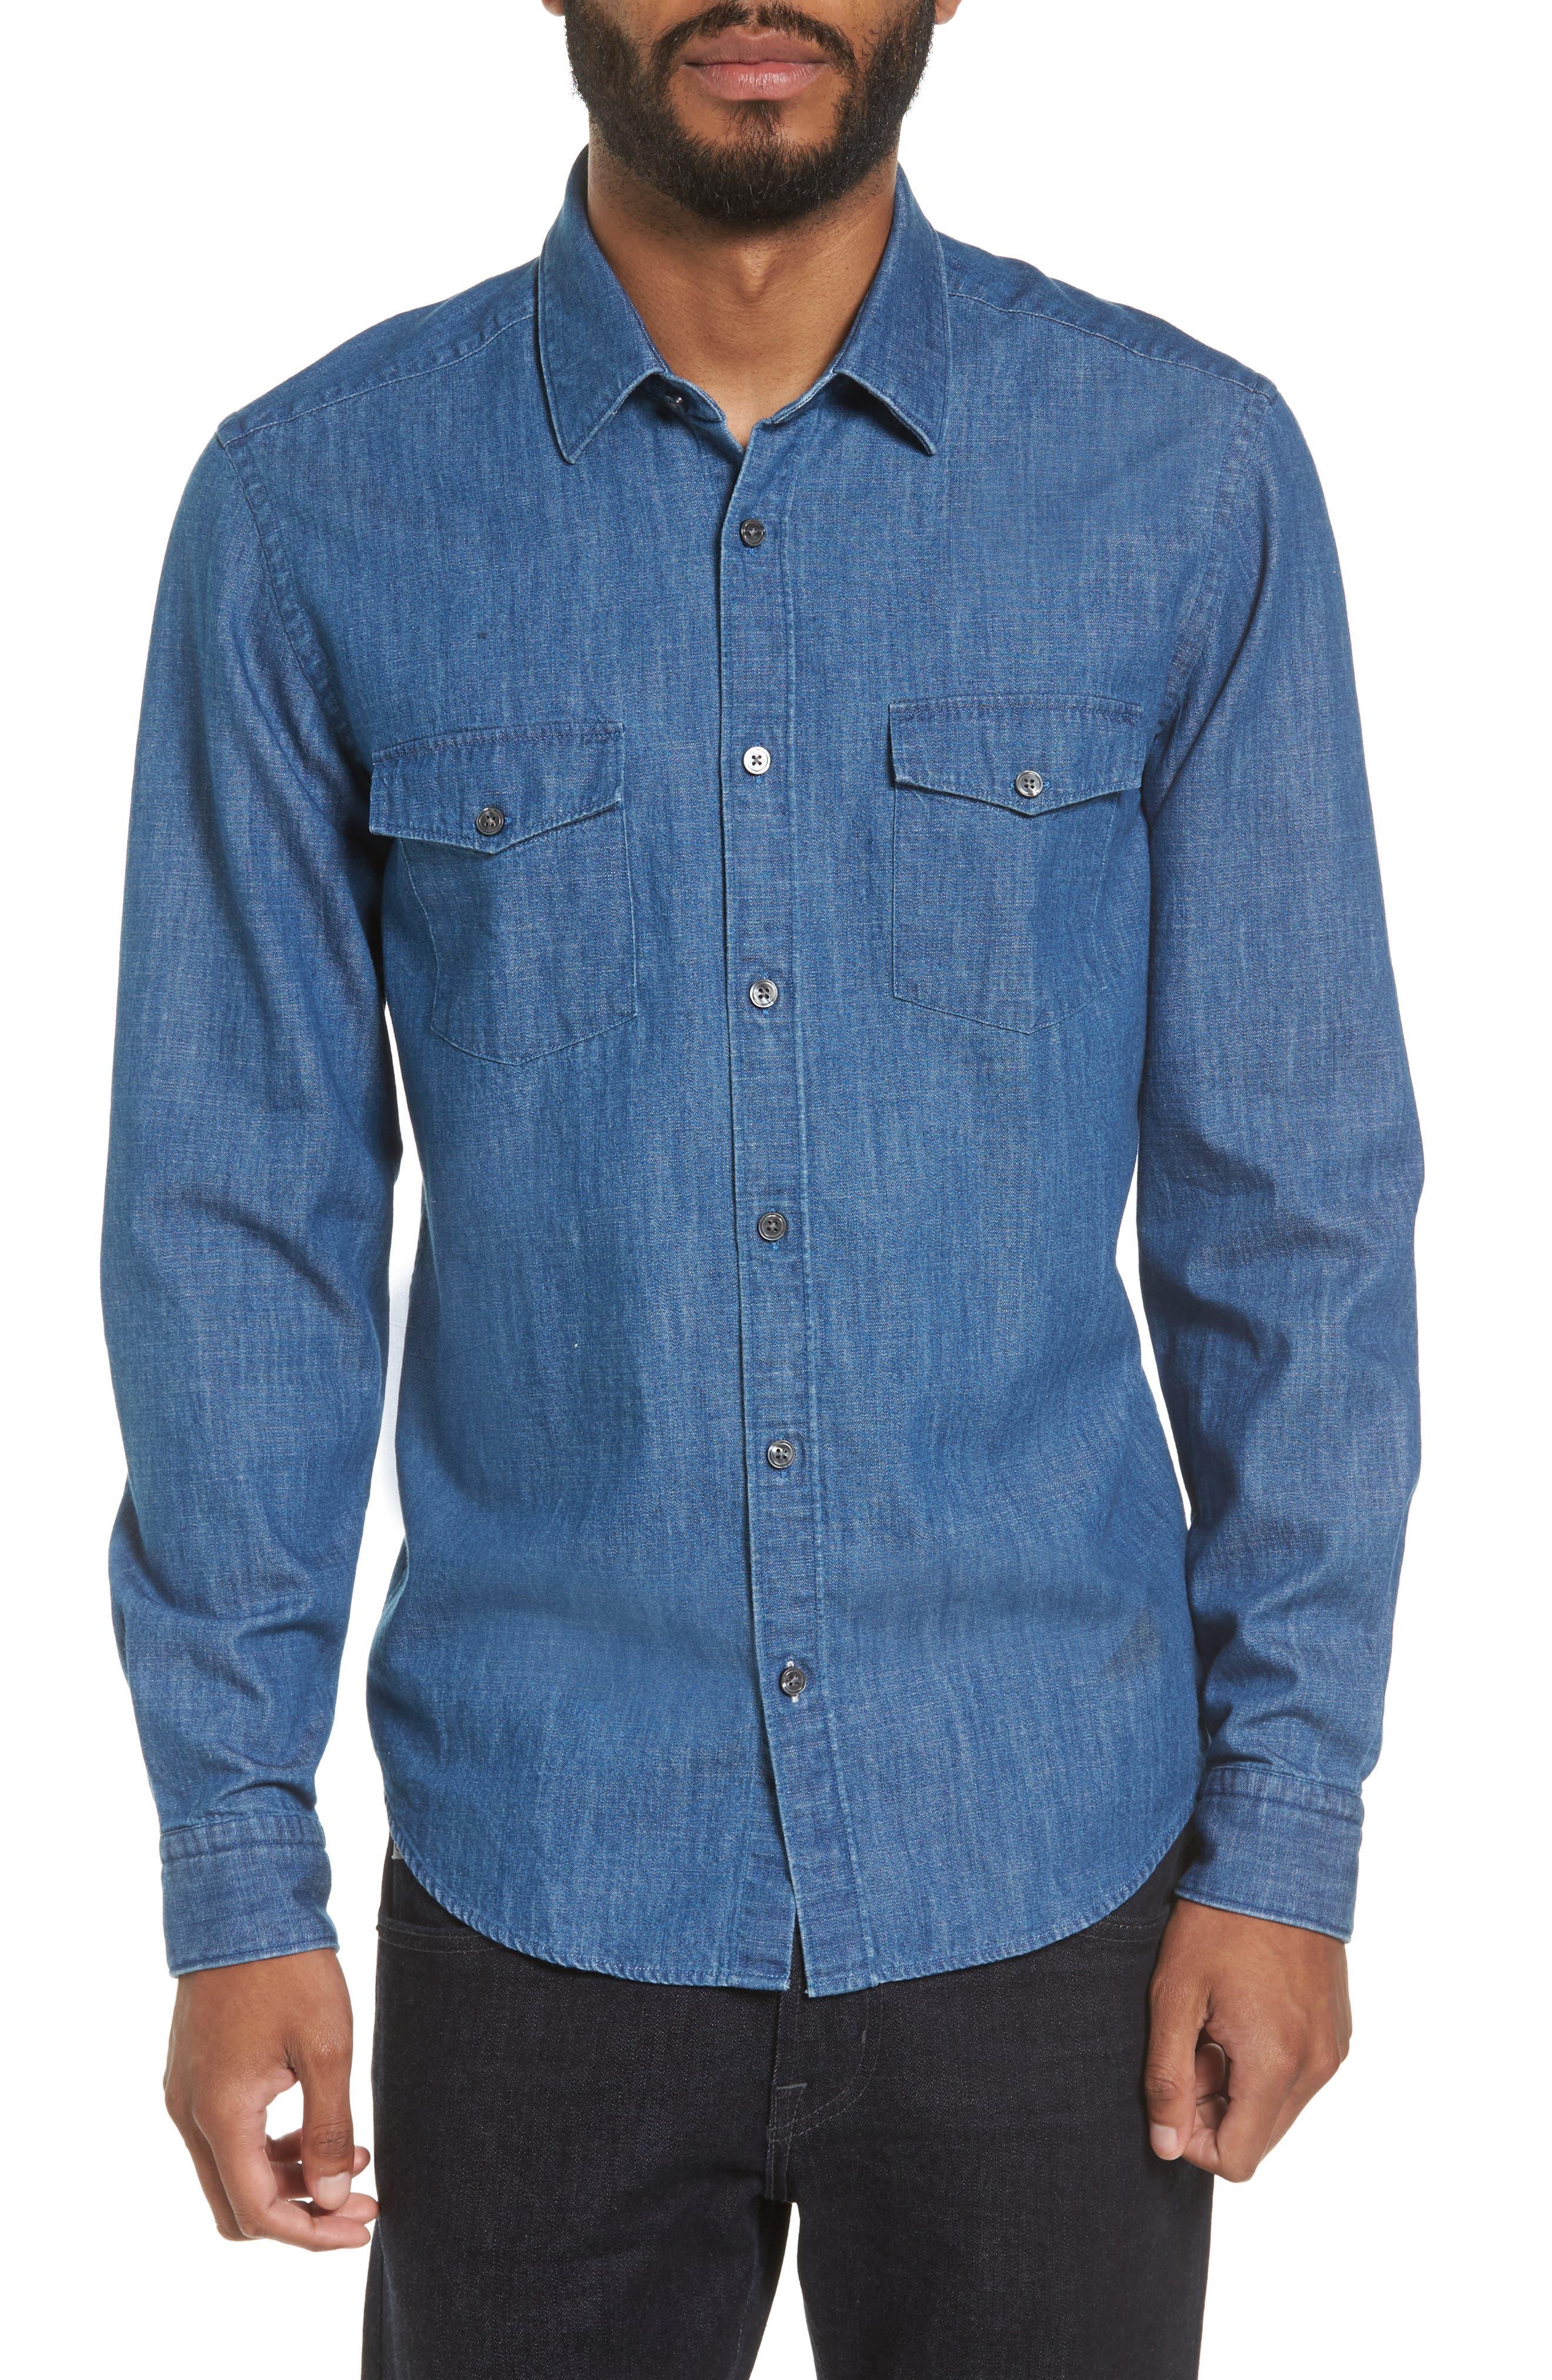 Alternate Image 1 Selected - BOSS Lance Regular Fit Two-Pocket Denim Sport Shirt